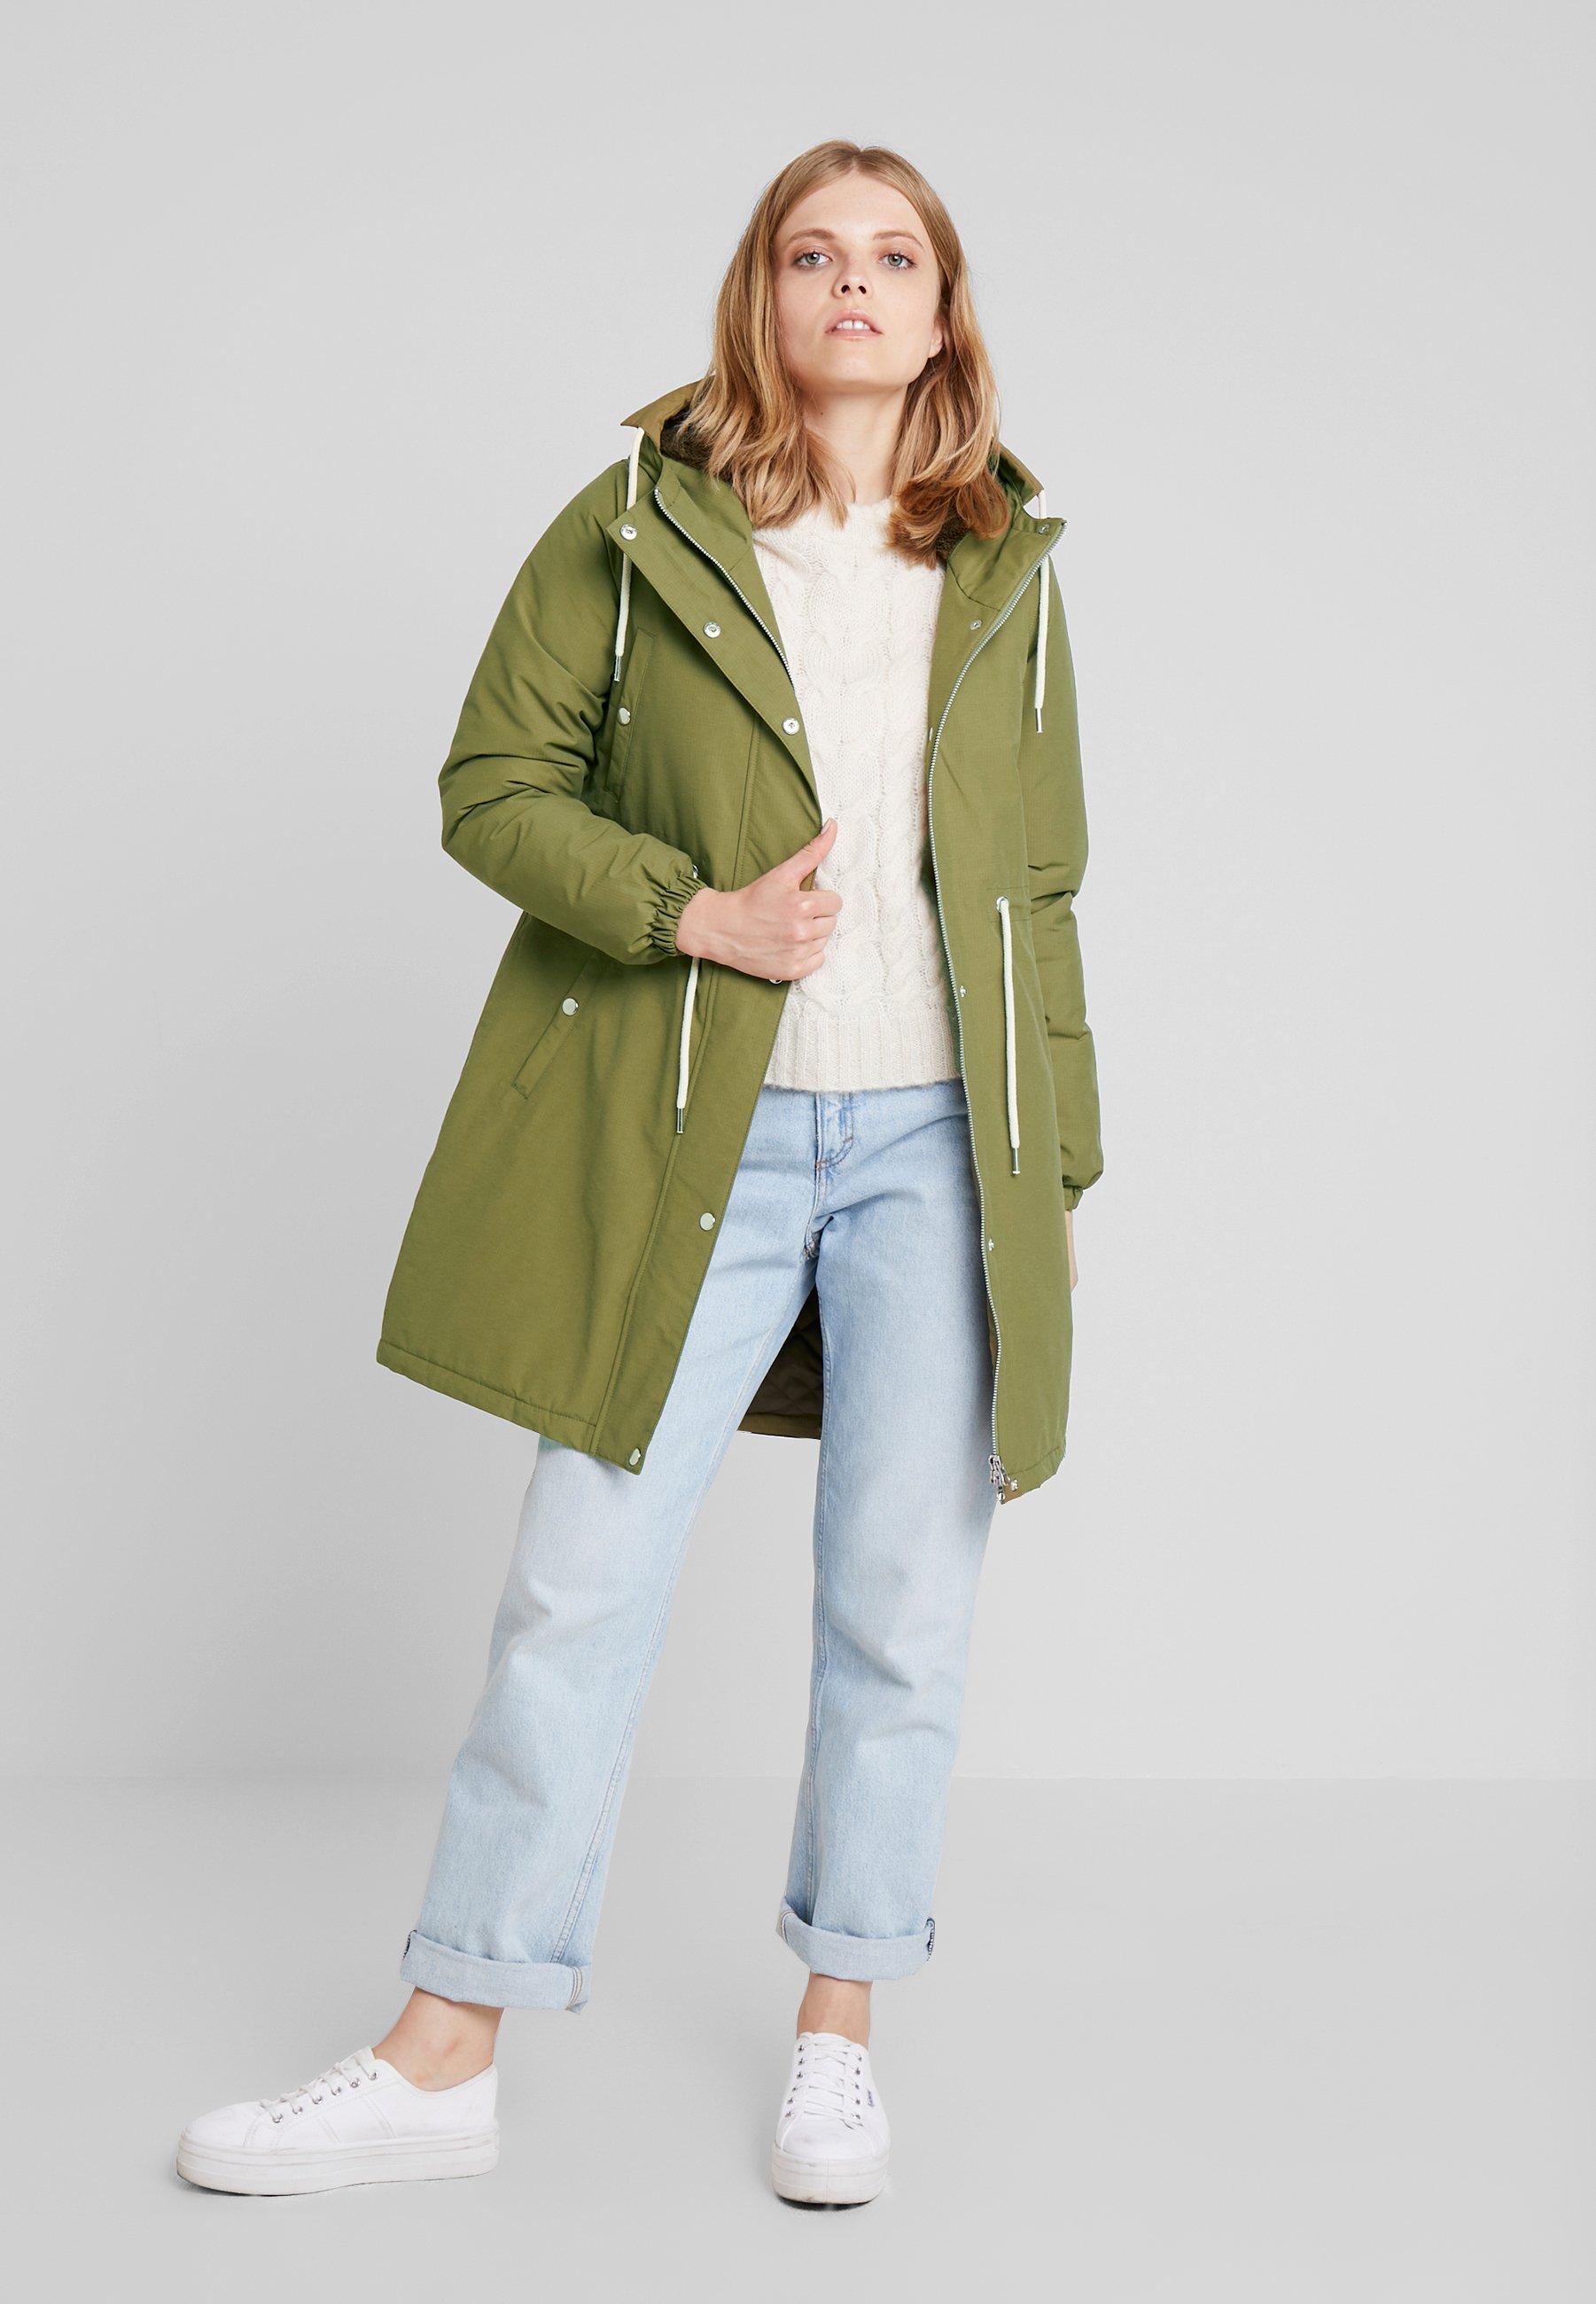 Big Sale Factory Outlet Women's Clothing Danefæ København NORA WINTER Winter coat olive 2qbj9aQ8M KquzOC1dc